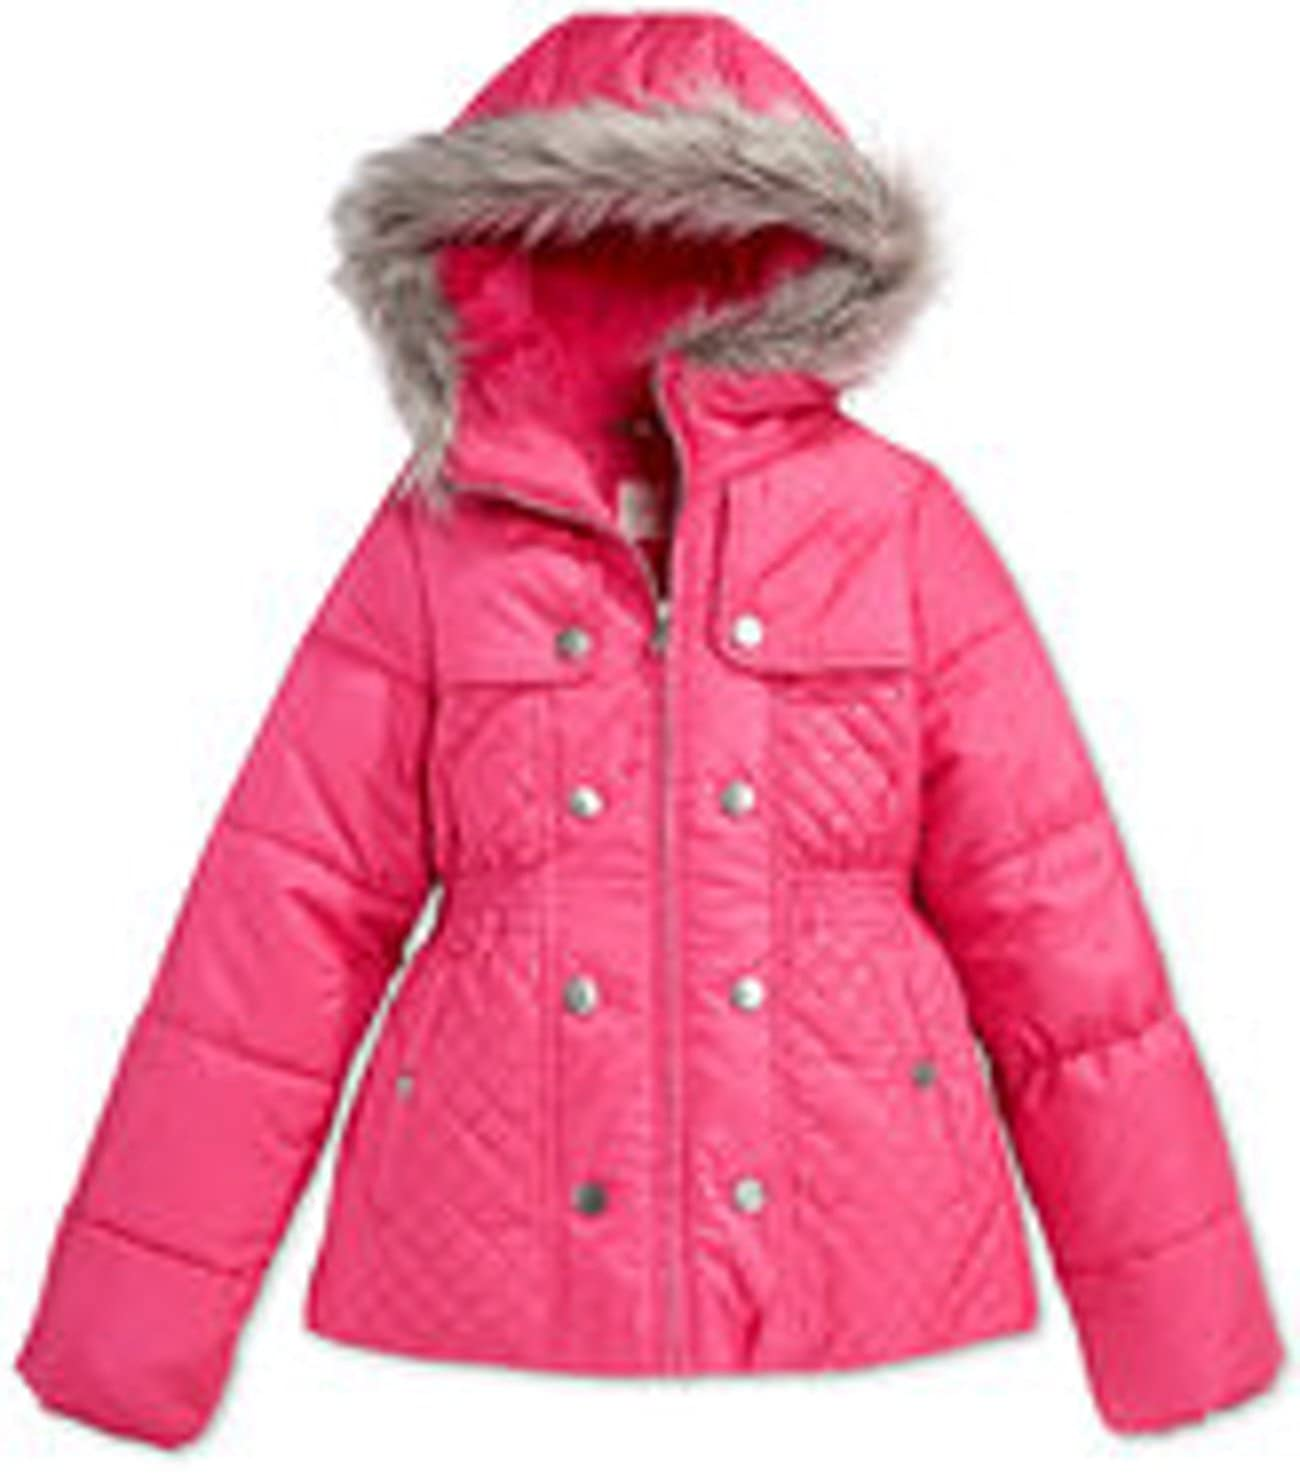 Jessica Simpson Girls Faux-Fur Hood Jacket Size L 14-16